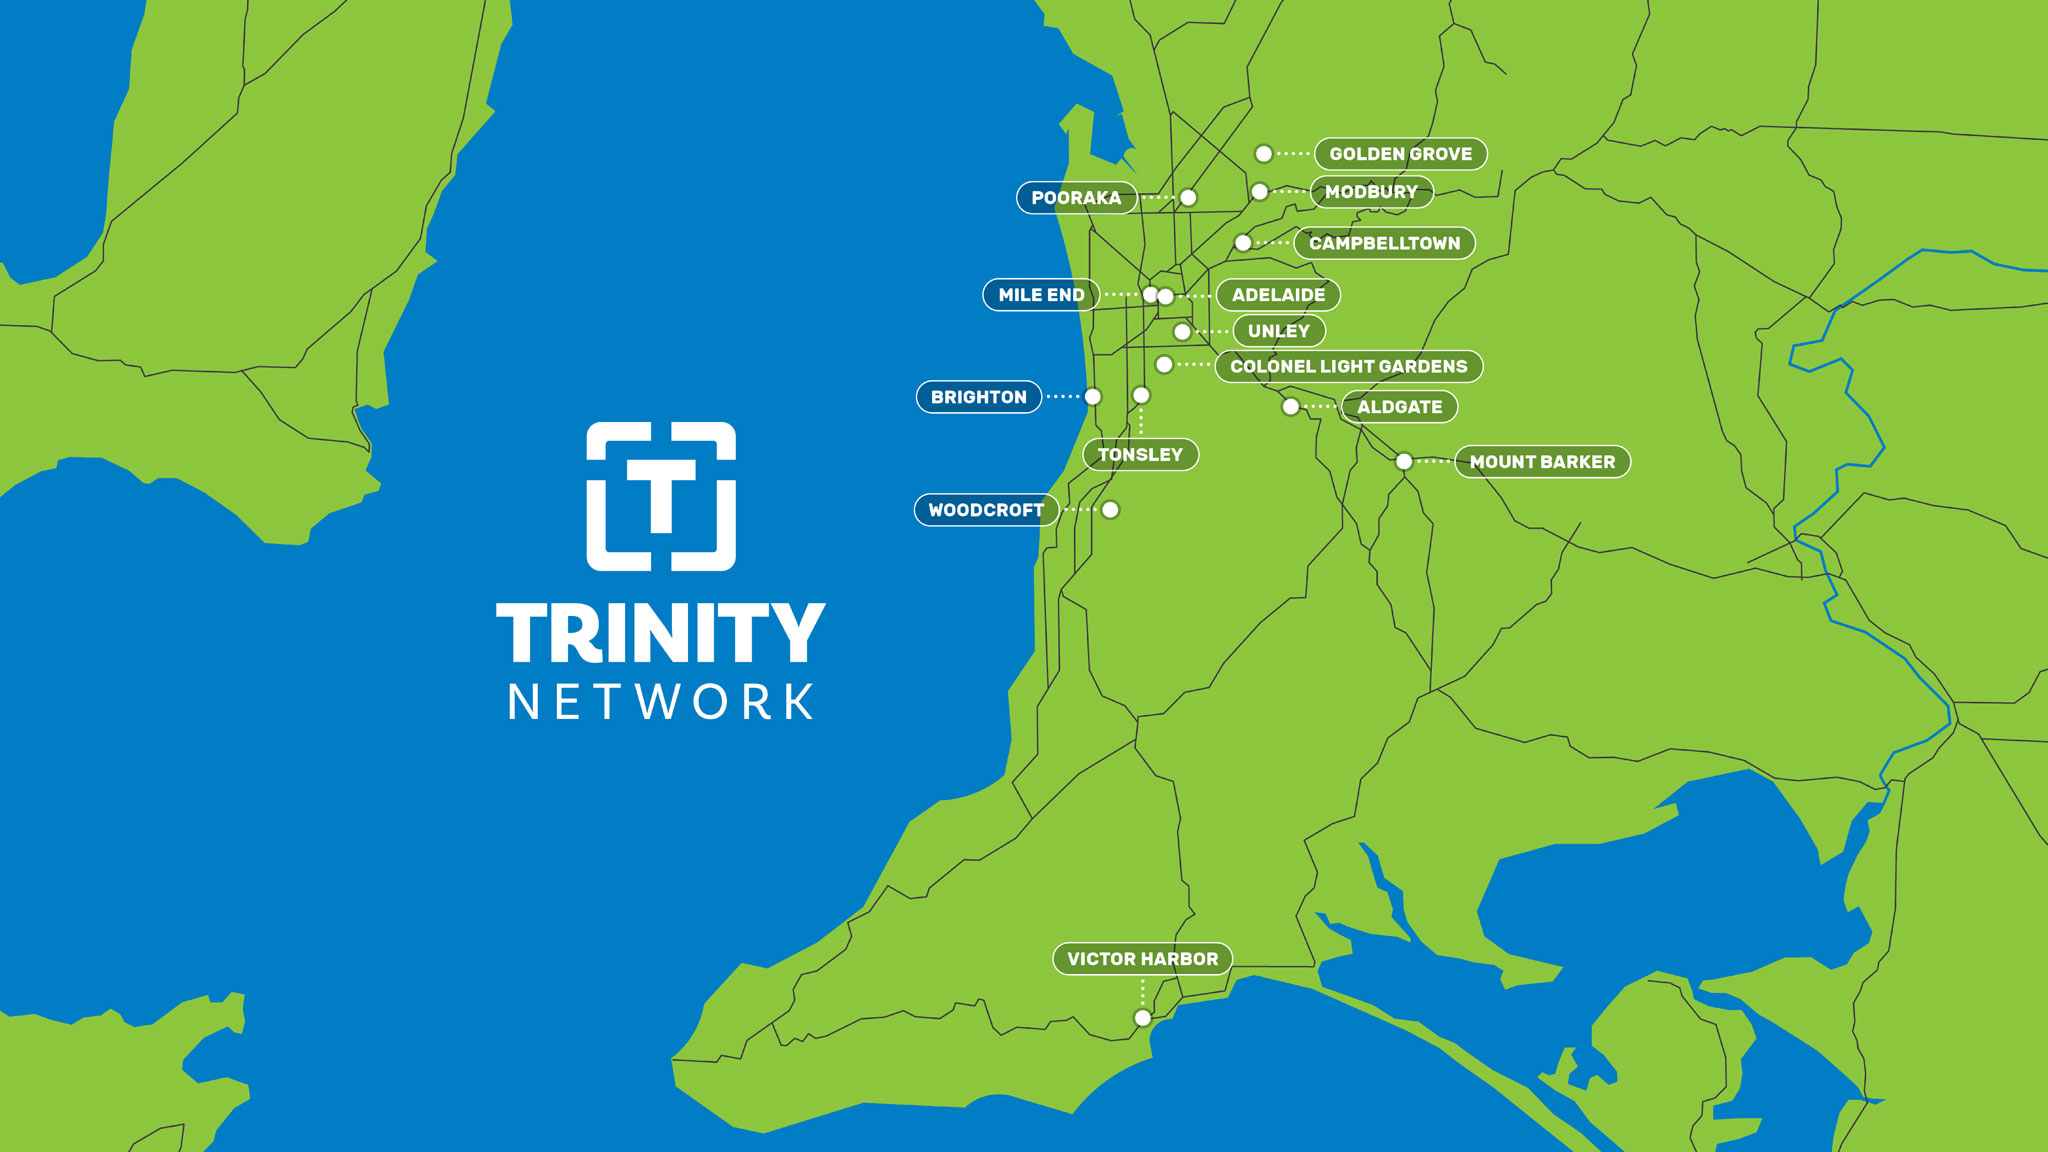 trinity-network-map